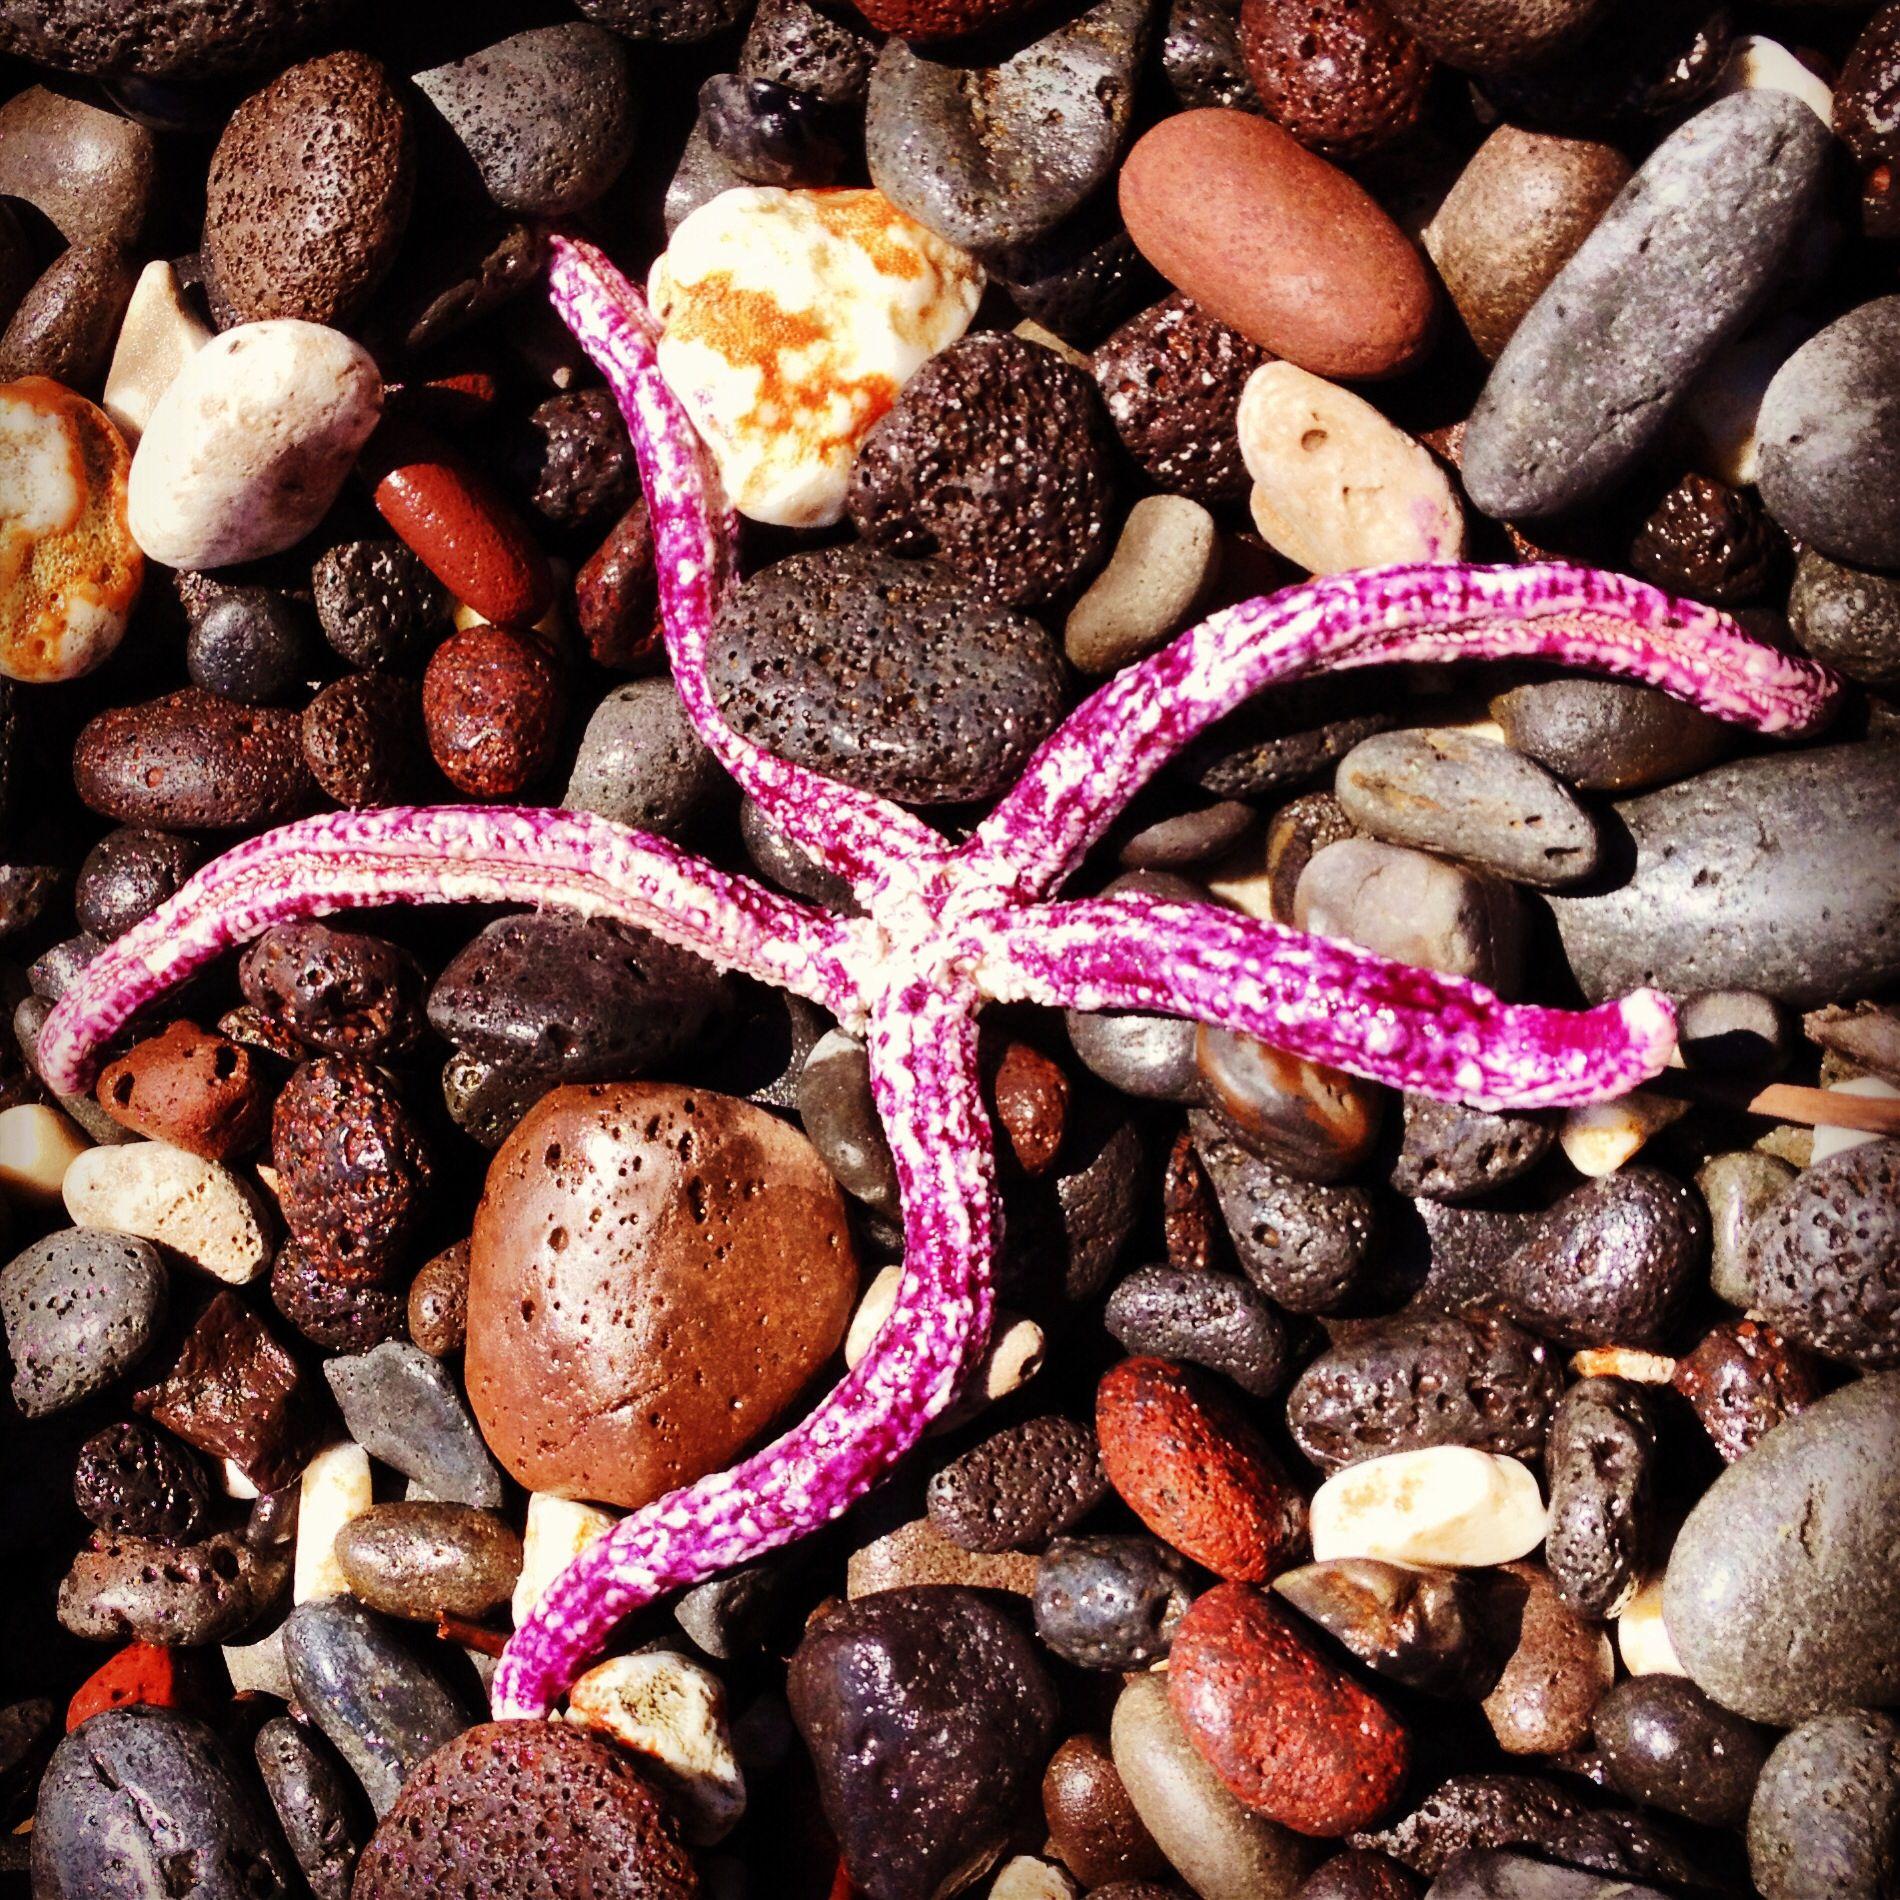 Maui purple starfish